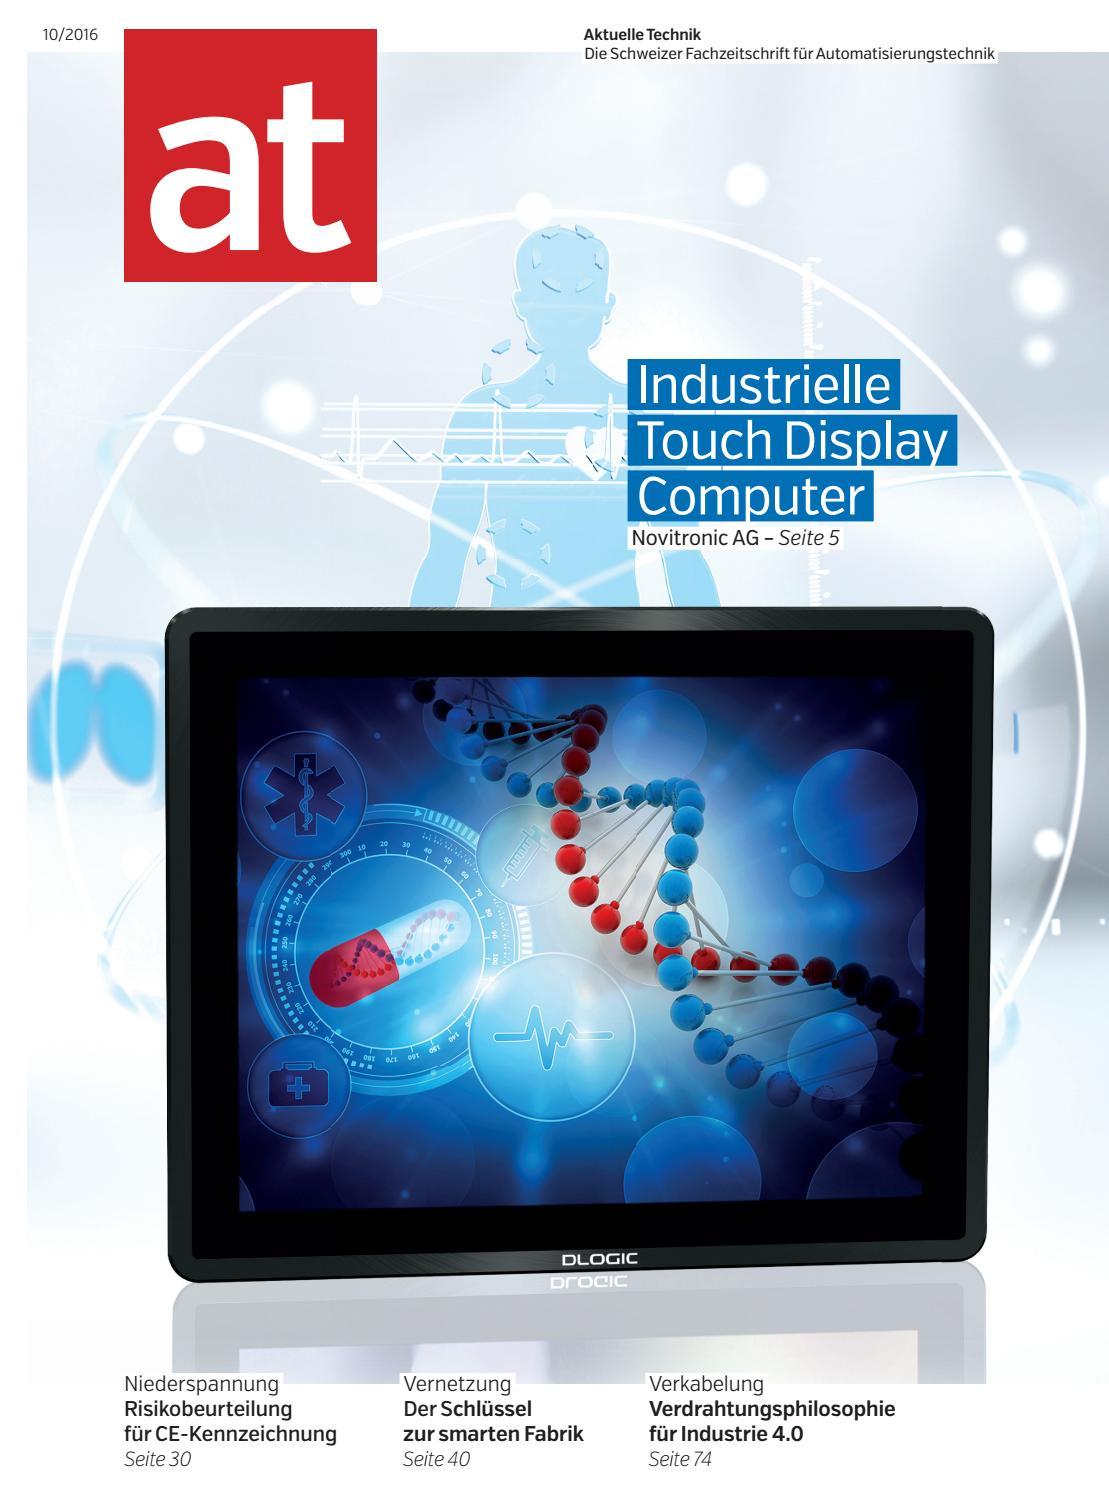 at - Aktuelle Technik 10 2016 by BL Verlag AG - issuu